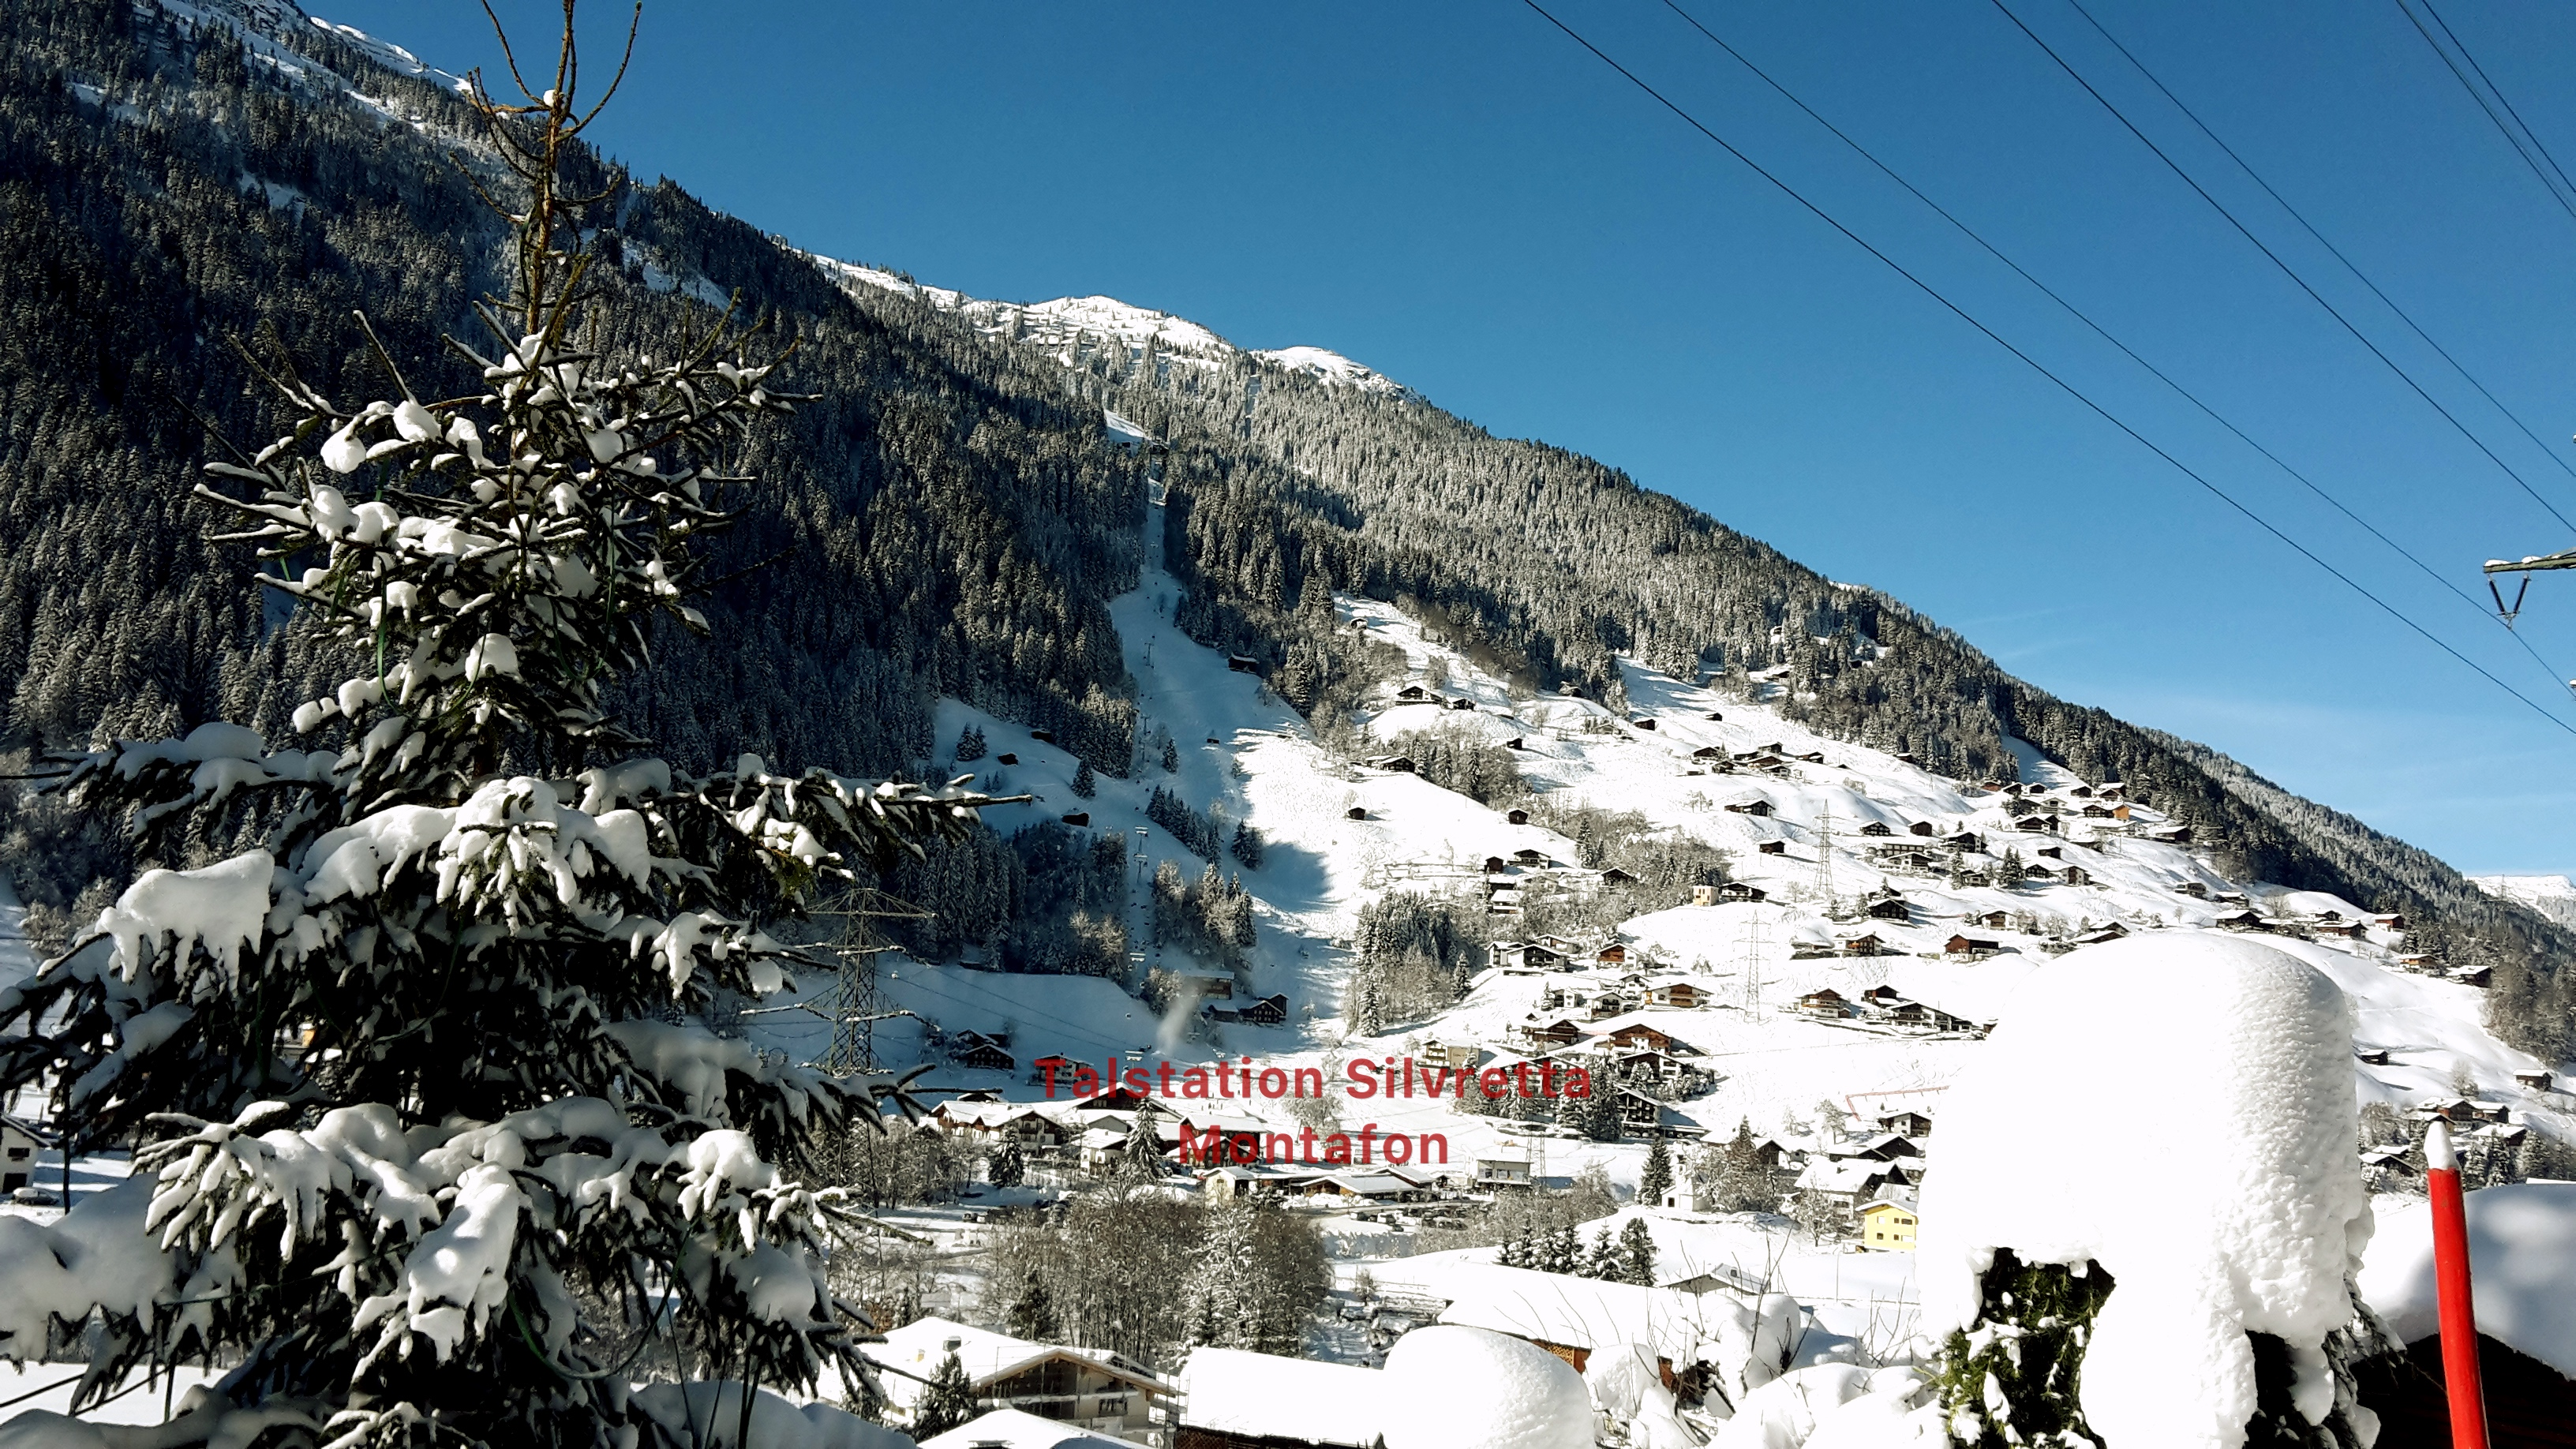 Ausblick zur Talstation SiMo